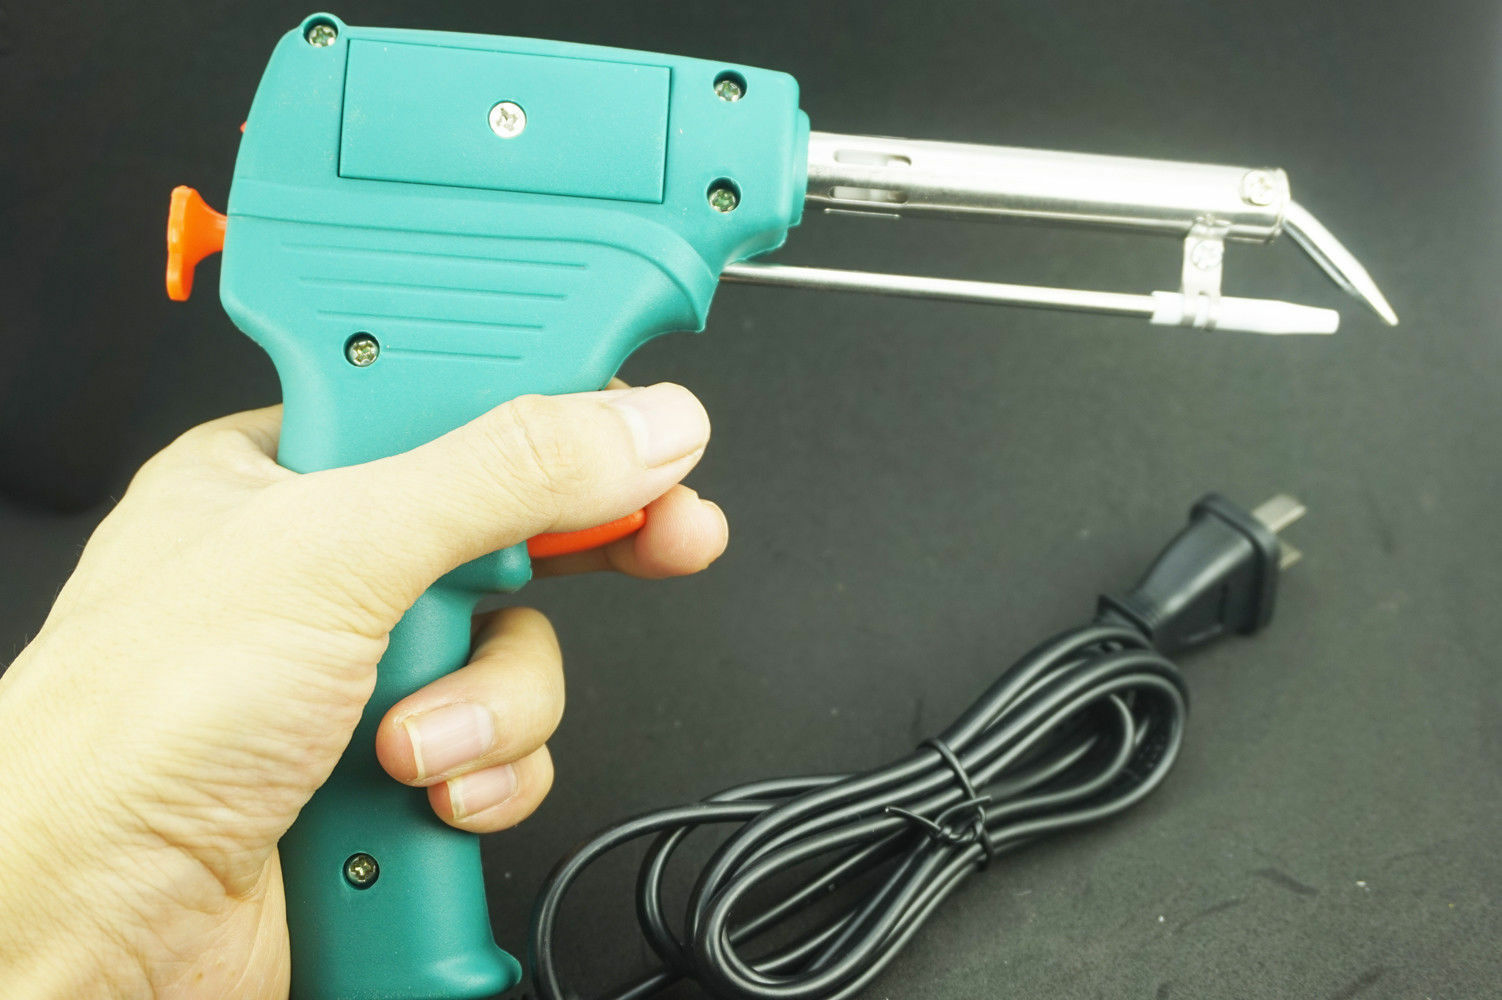 HEAVY DUTY ELECTRIC ELECTRICAL SOLDER SOLDERING IRON GUN BENT TIP 240V 60W